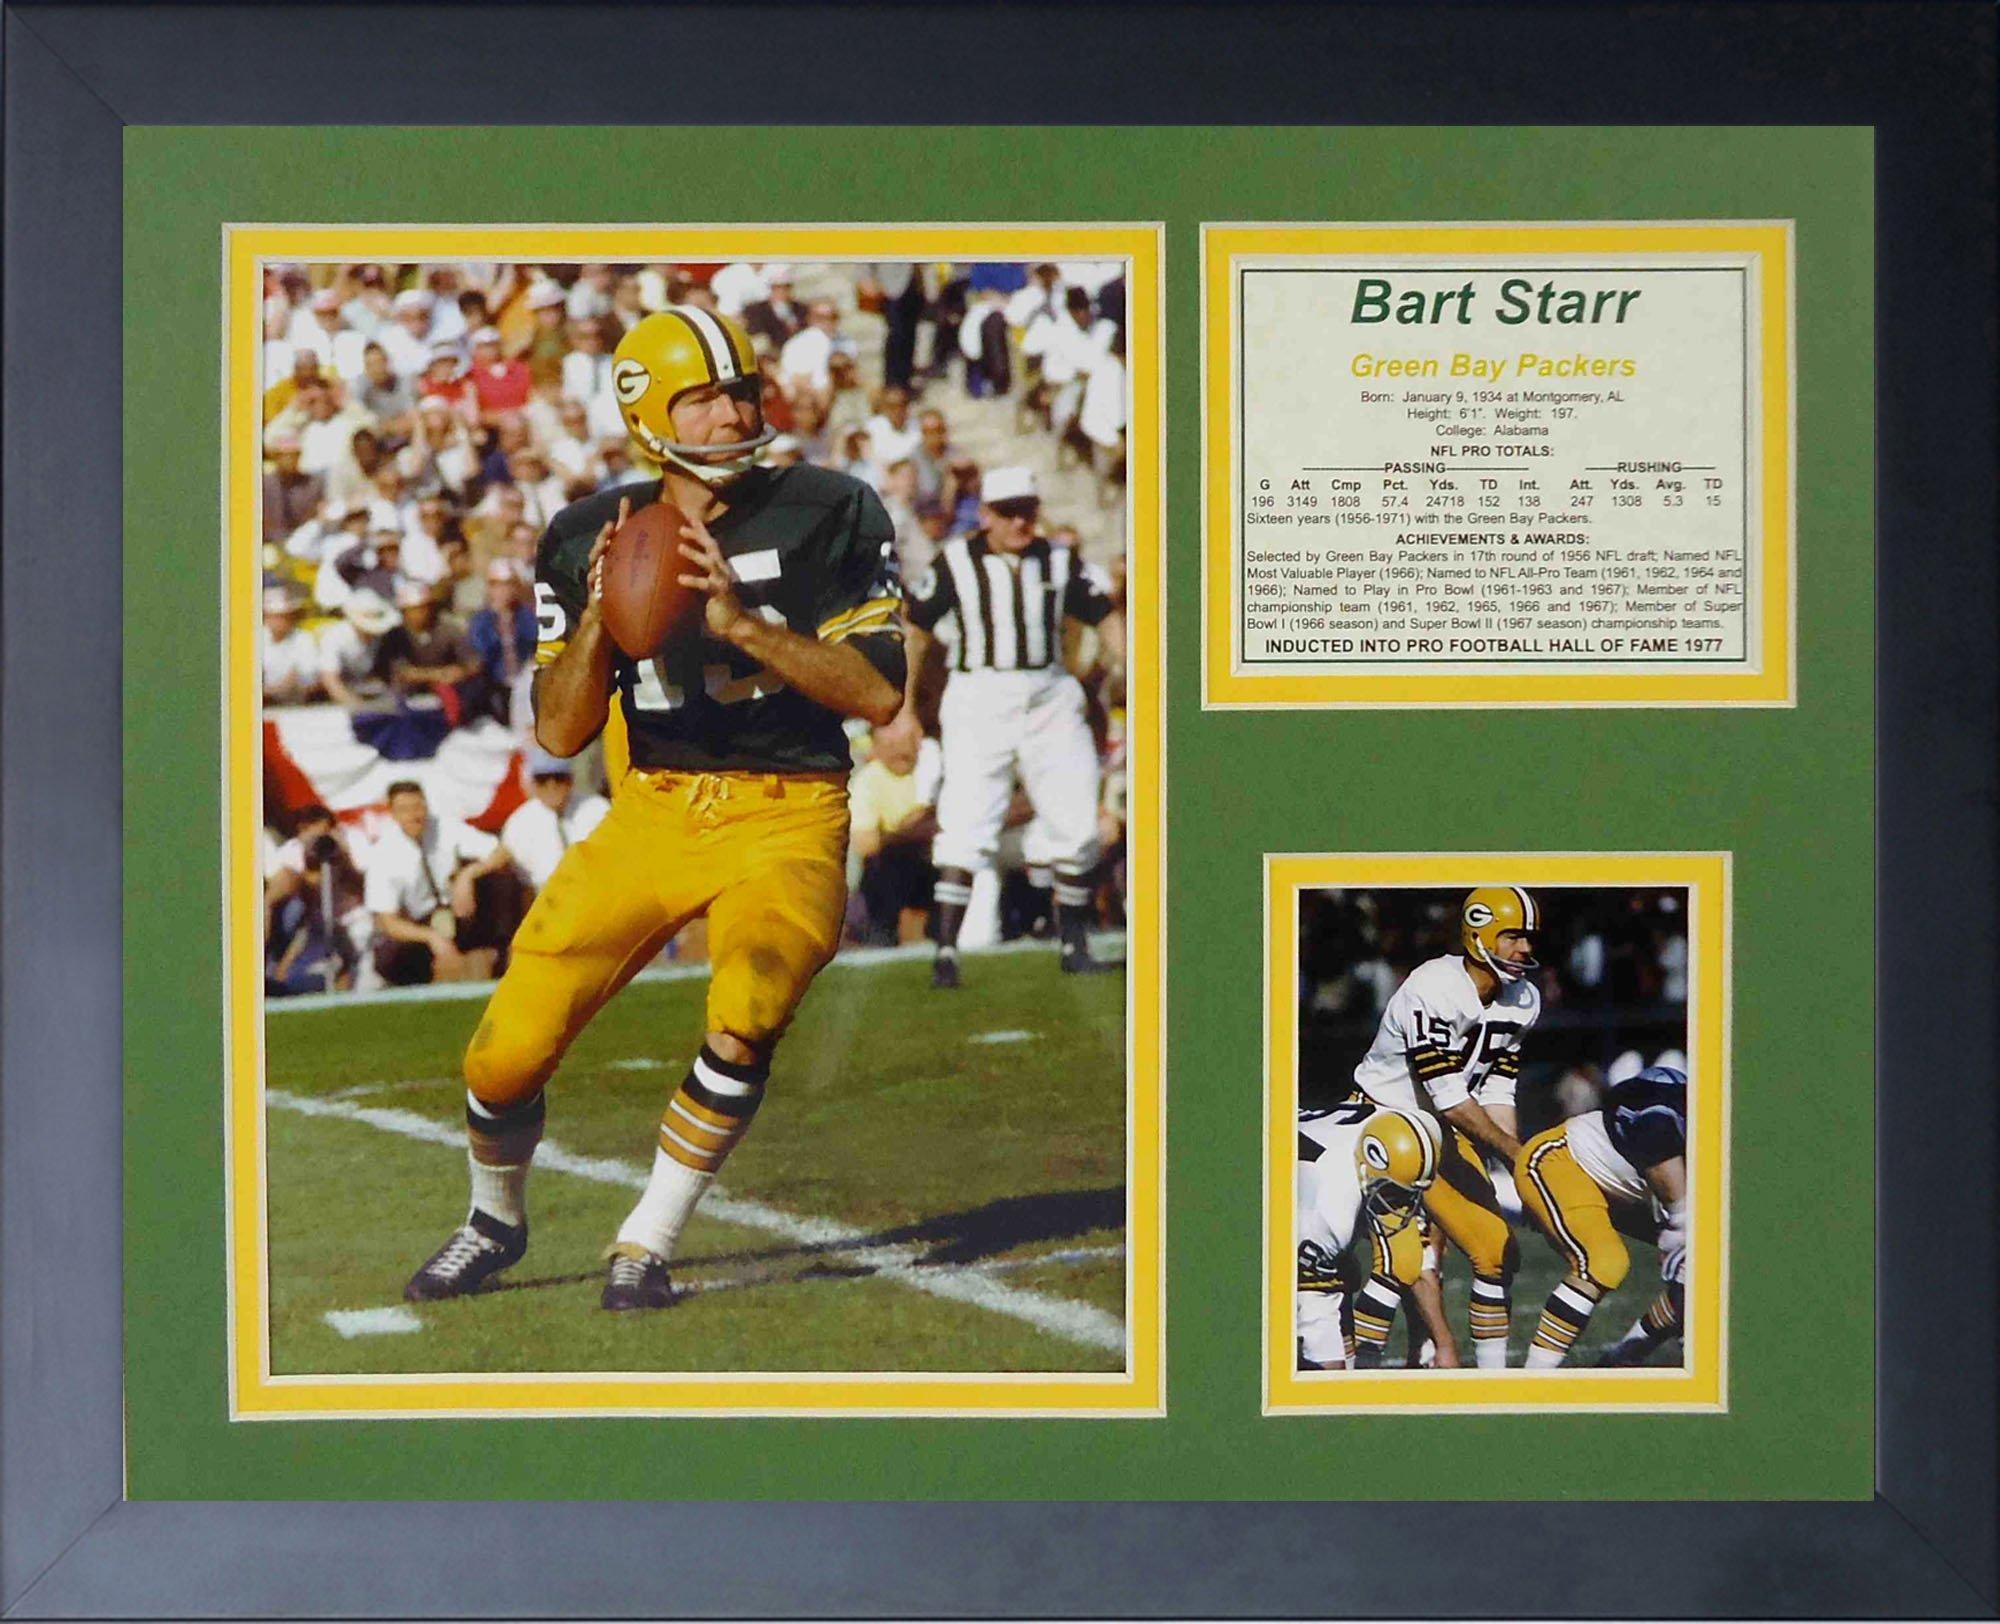 Legends Never Die Bart Starr Framed Photo Collage, 11x14-Inch by Legends Never Die